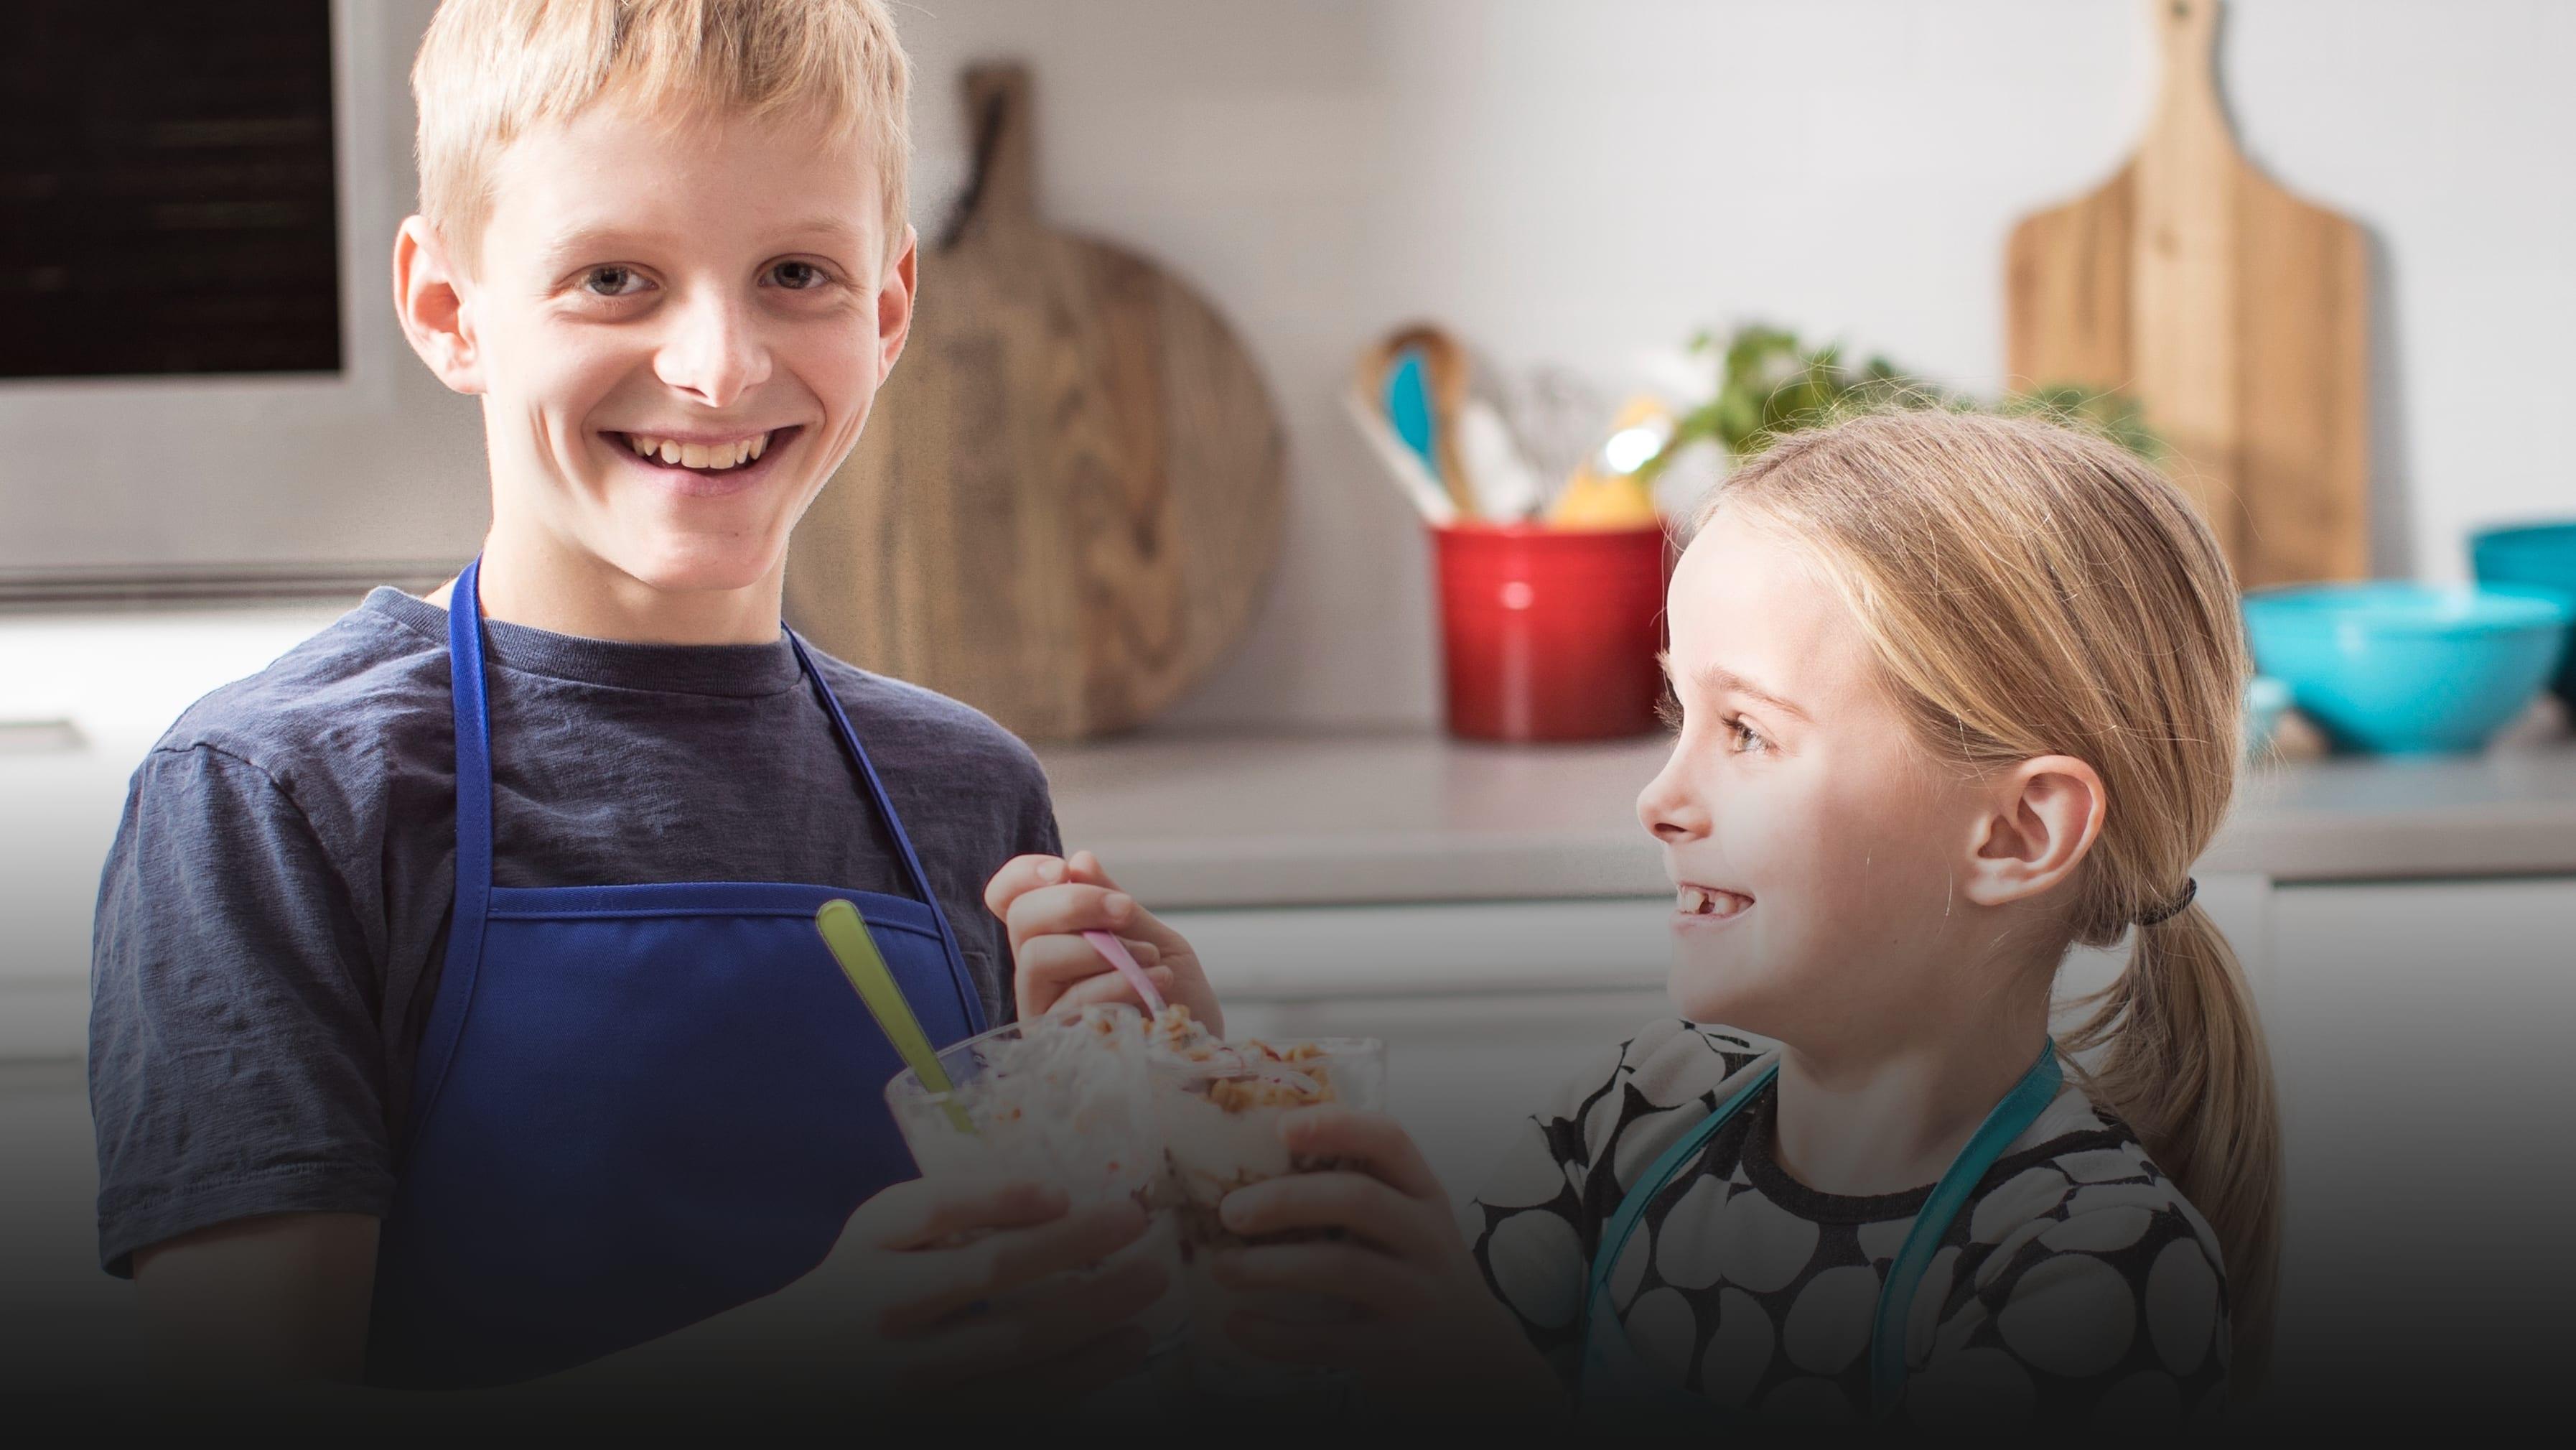 Kitchen Classroom 2021: Week 15